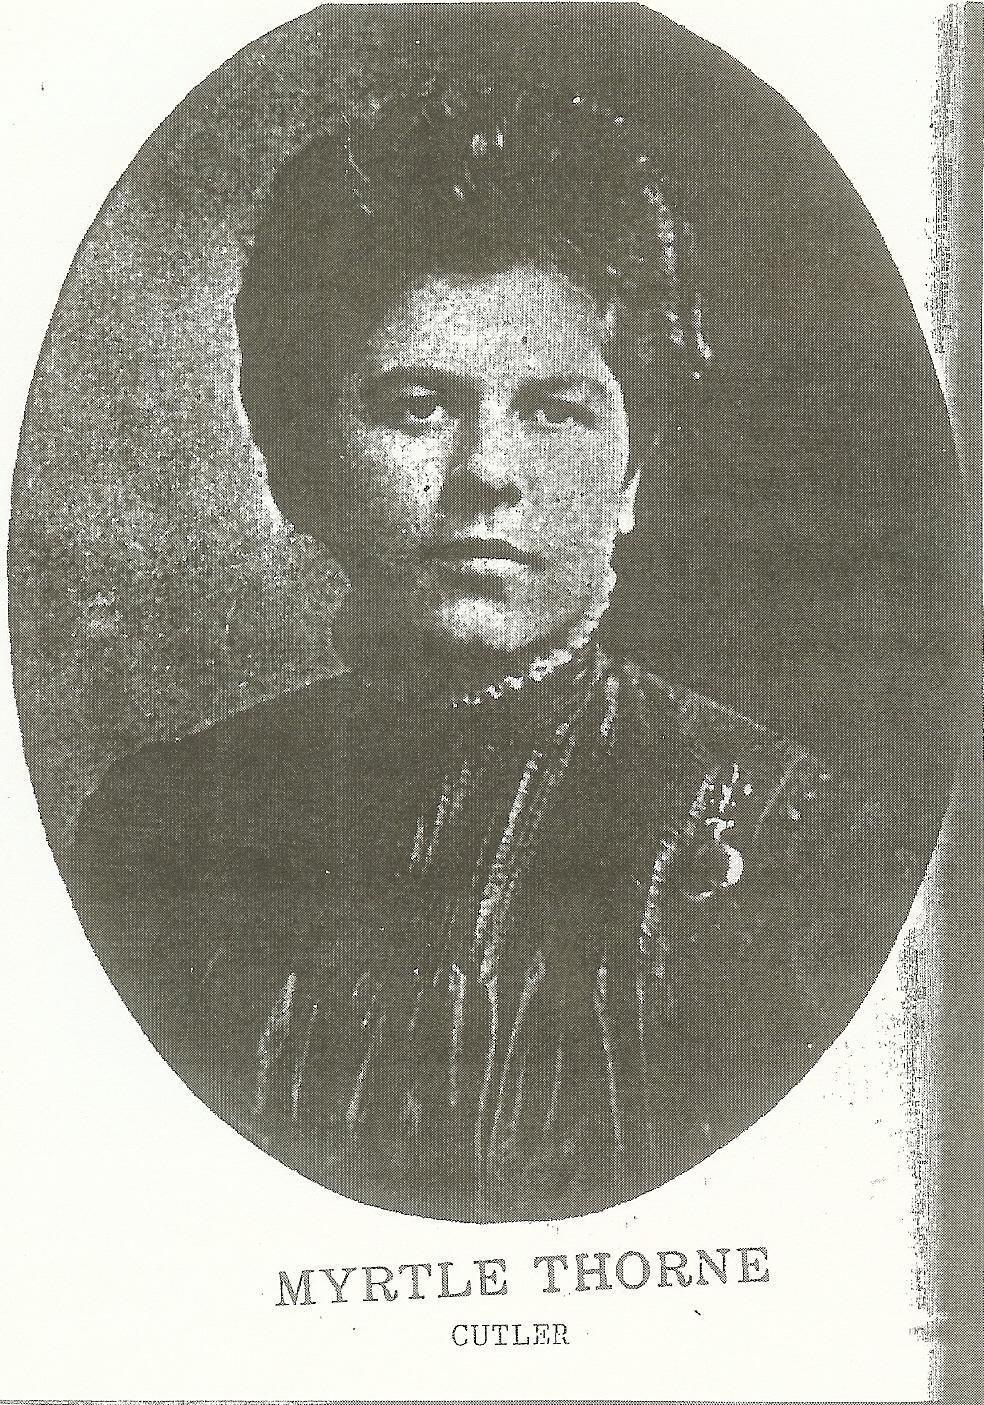 Myrtle E. Thorne Cutler